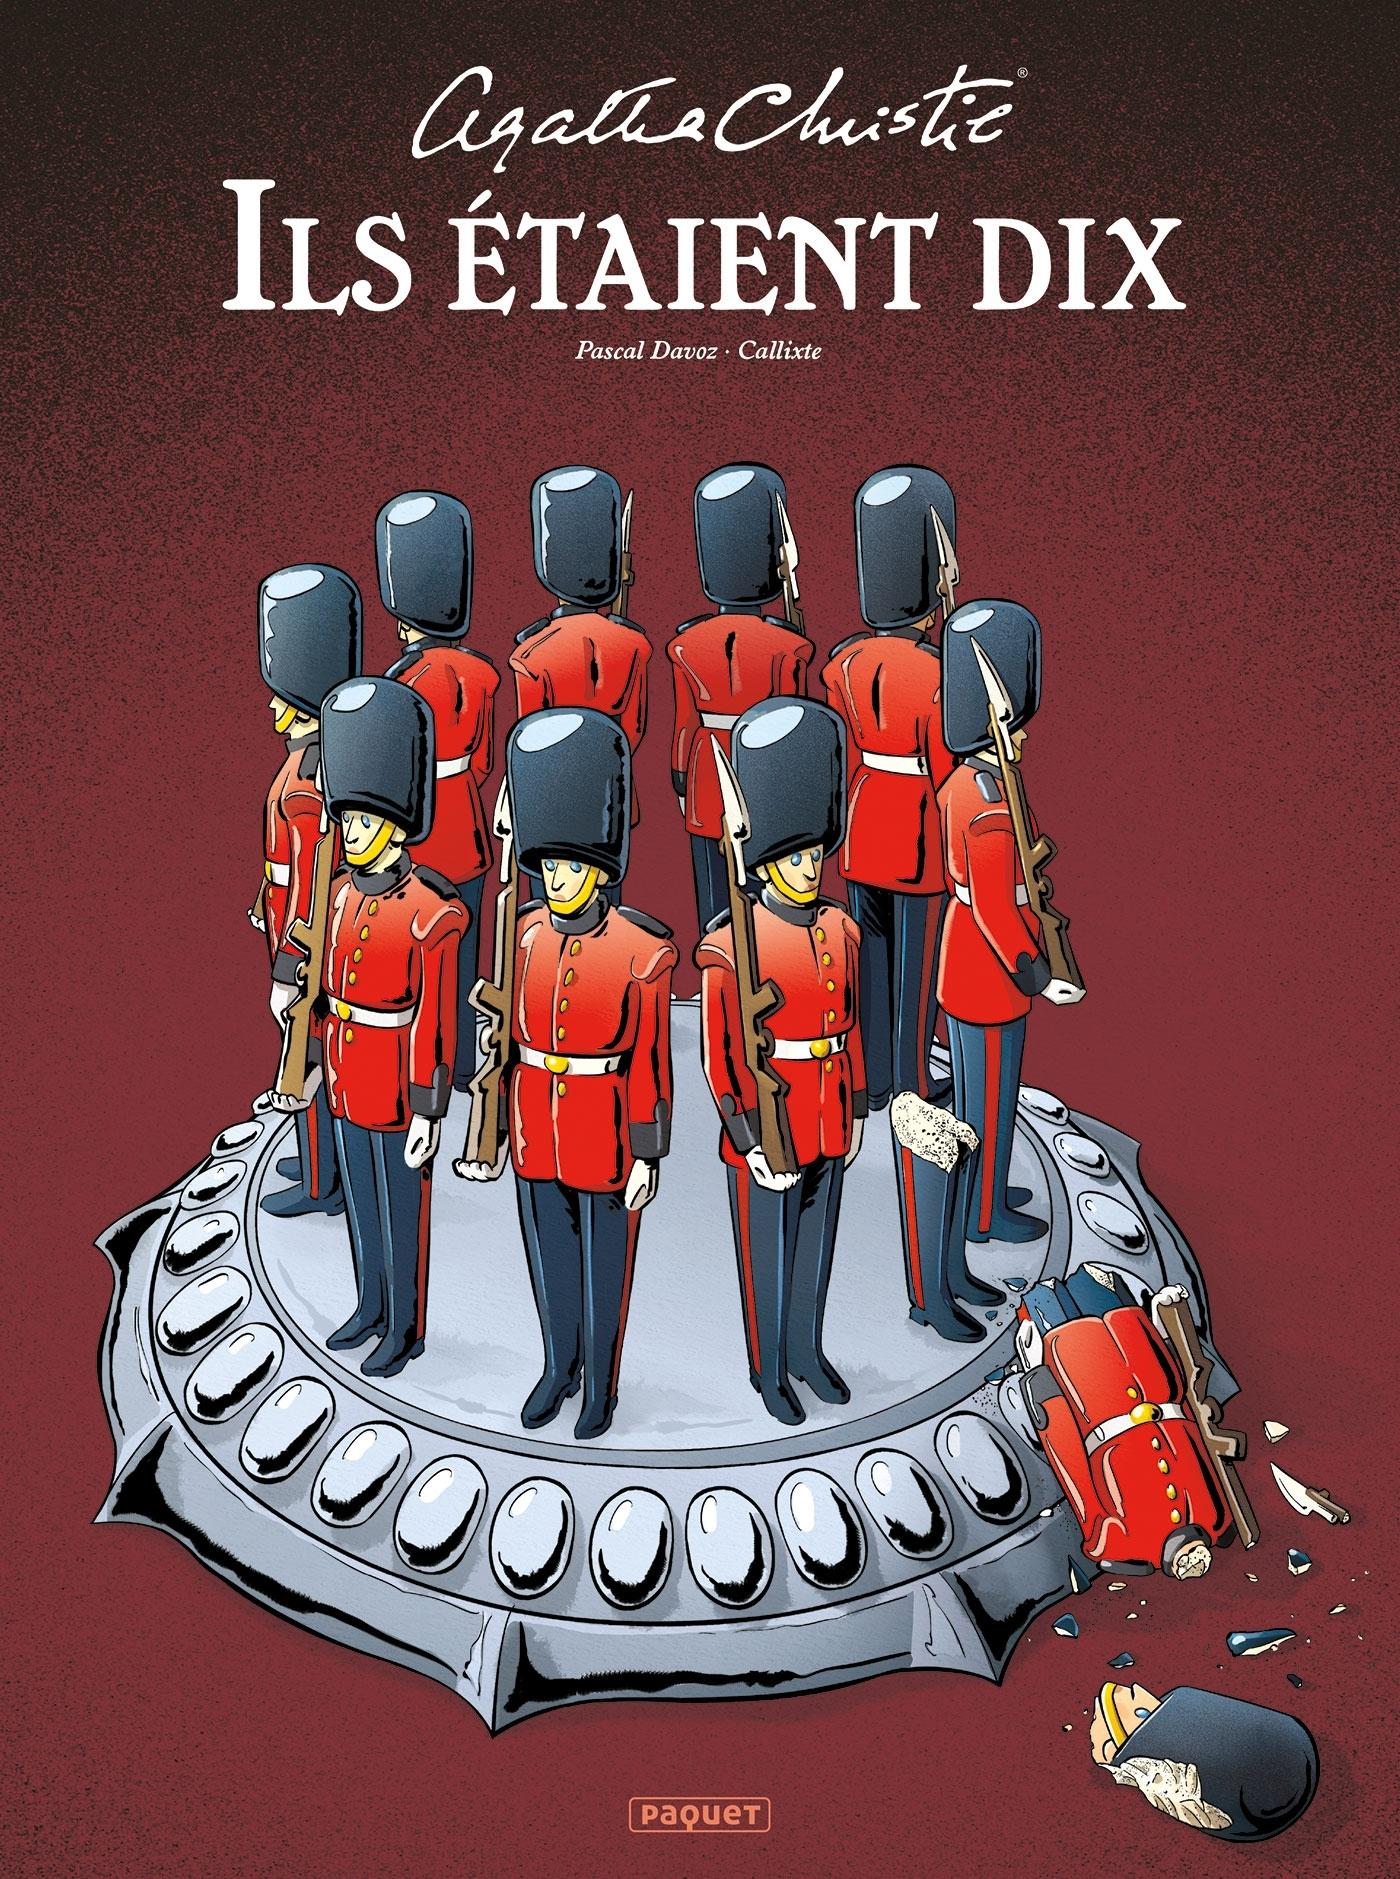 ILS ETAIENT DIX